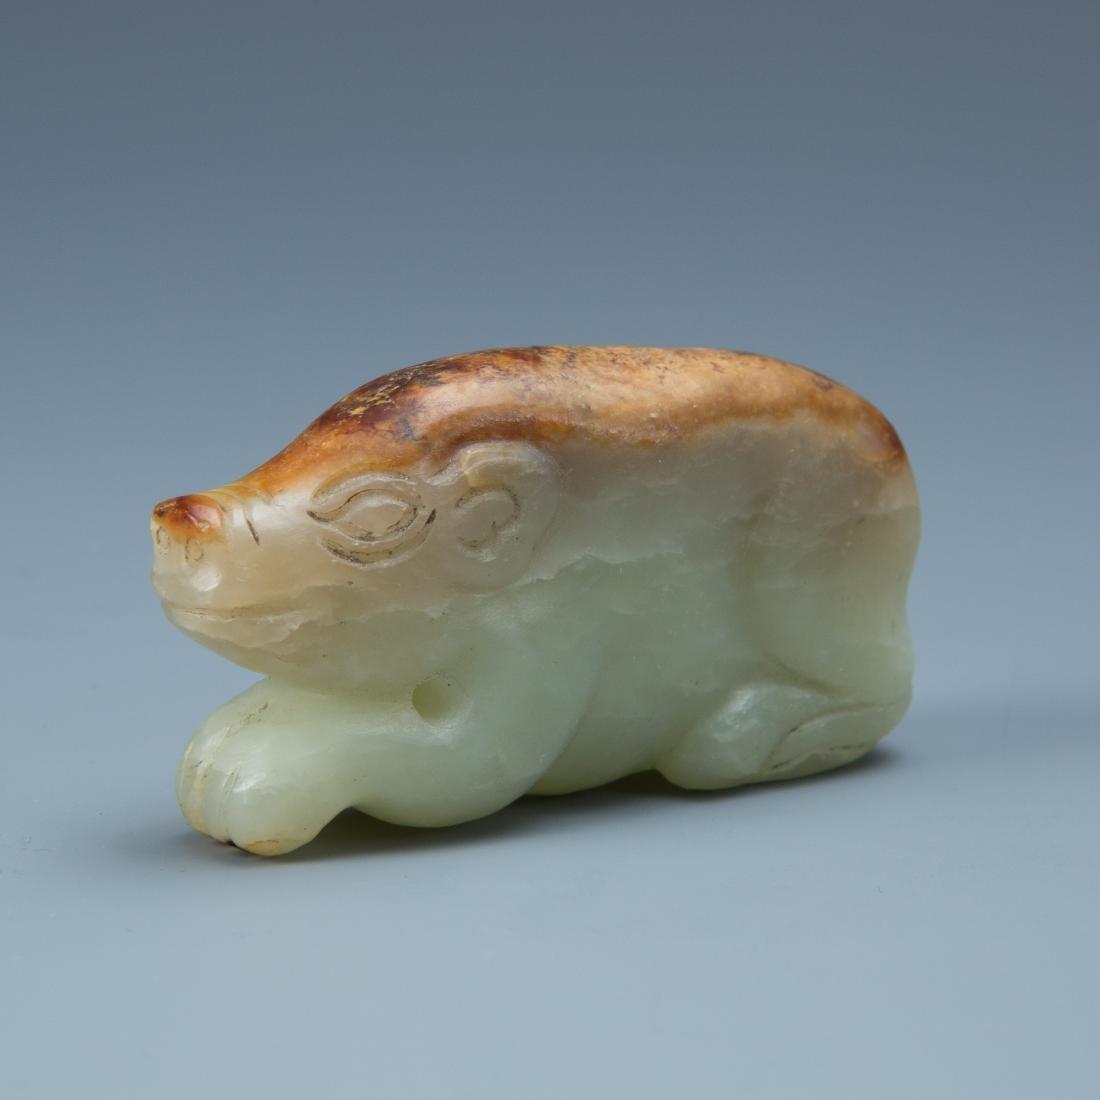 Estate Sale: 3pc Carved Jade Ring, Snuff Bottle & Swine - 3